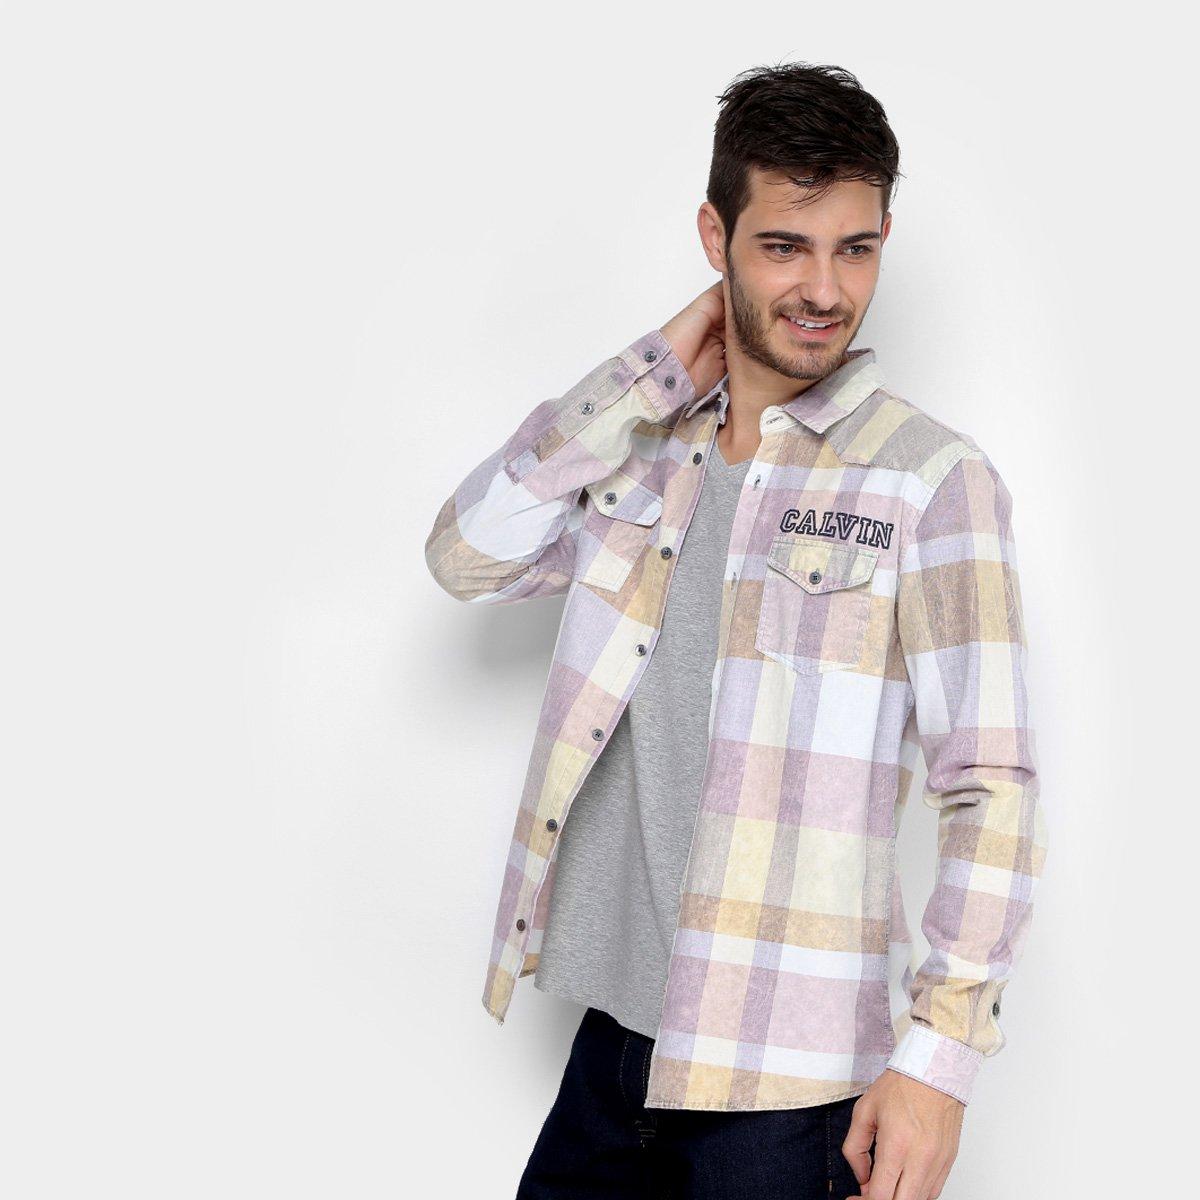 e9743c2a3b Camisa Calvin Klein Xadrez com Bolso Masculina. undefined